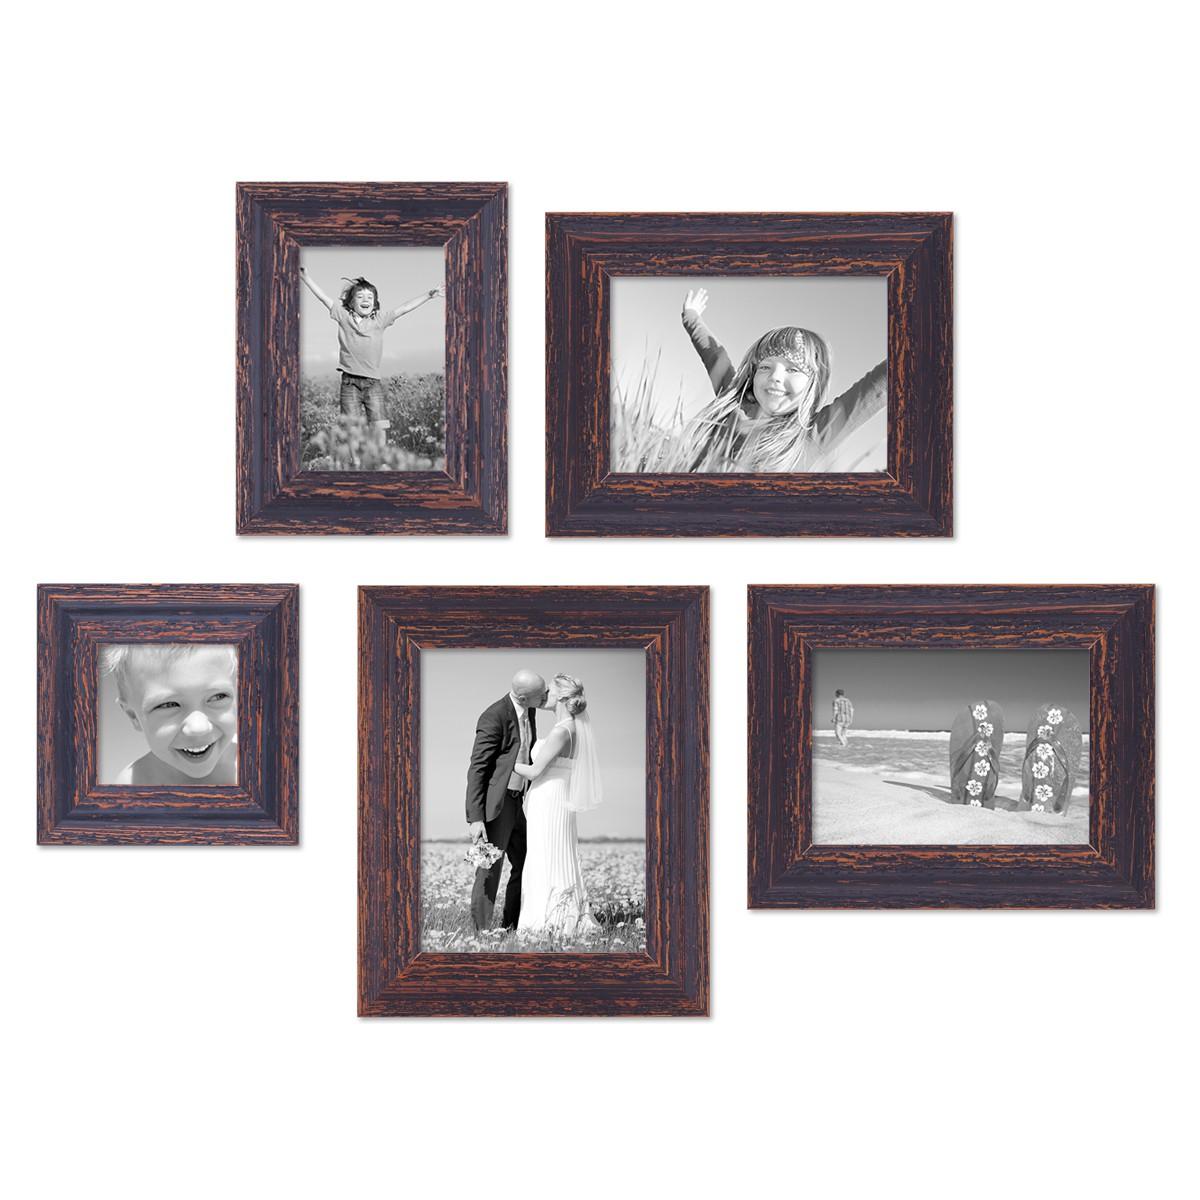 5er set bilderrahmen dunkelbraun shabby chic vintage 10x10 10x15 13x18 und 15x20 cm inkl. Black Bedroom Furniture Sets. Home Design Ideas